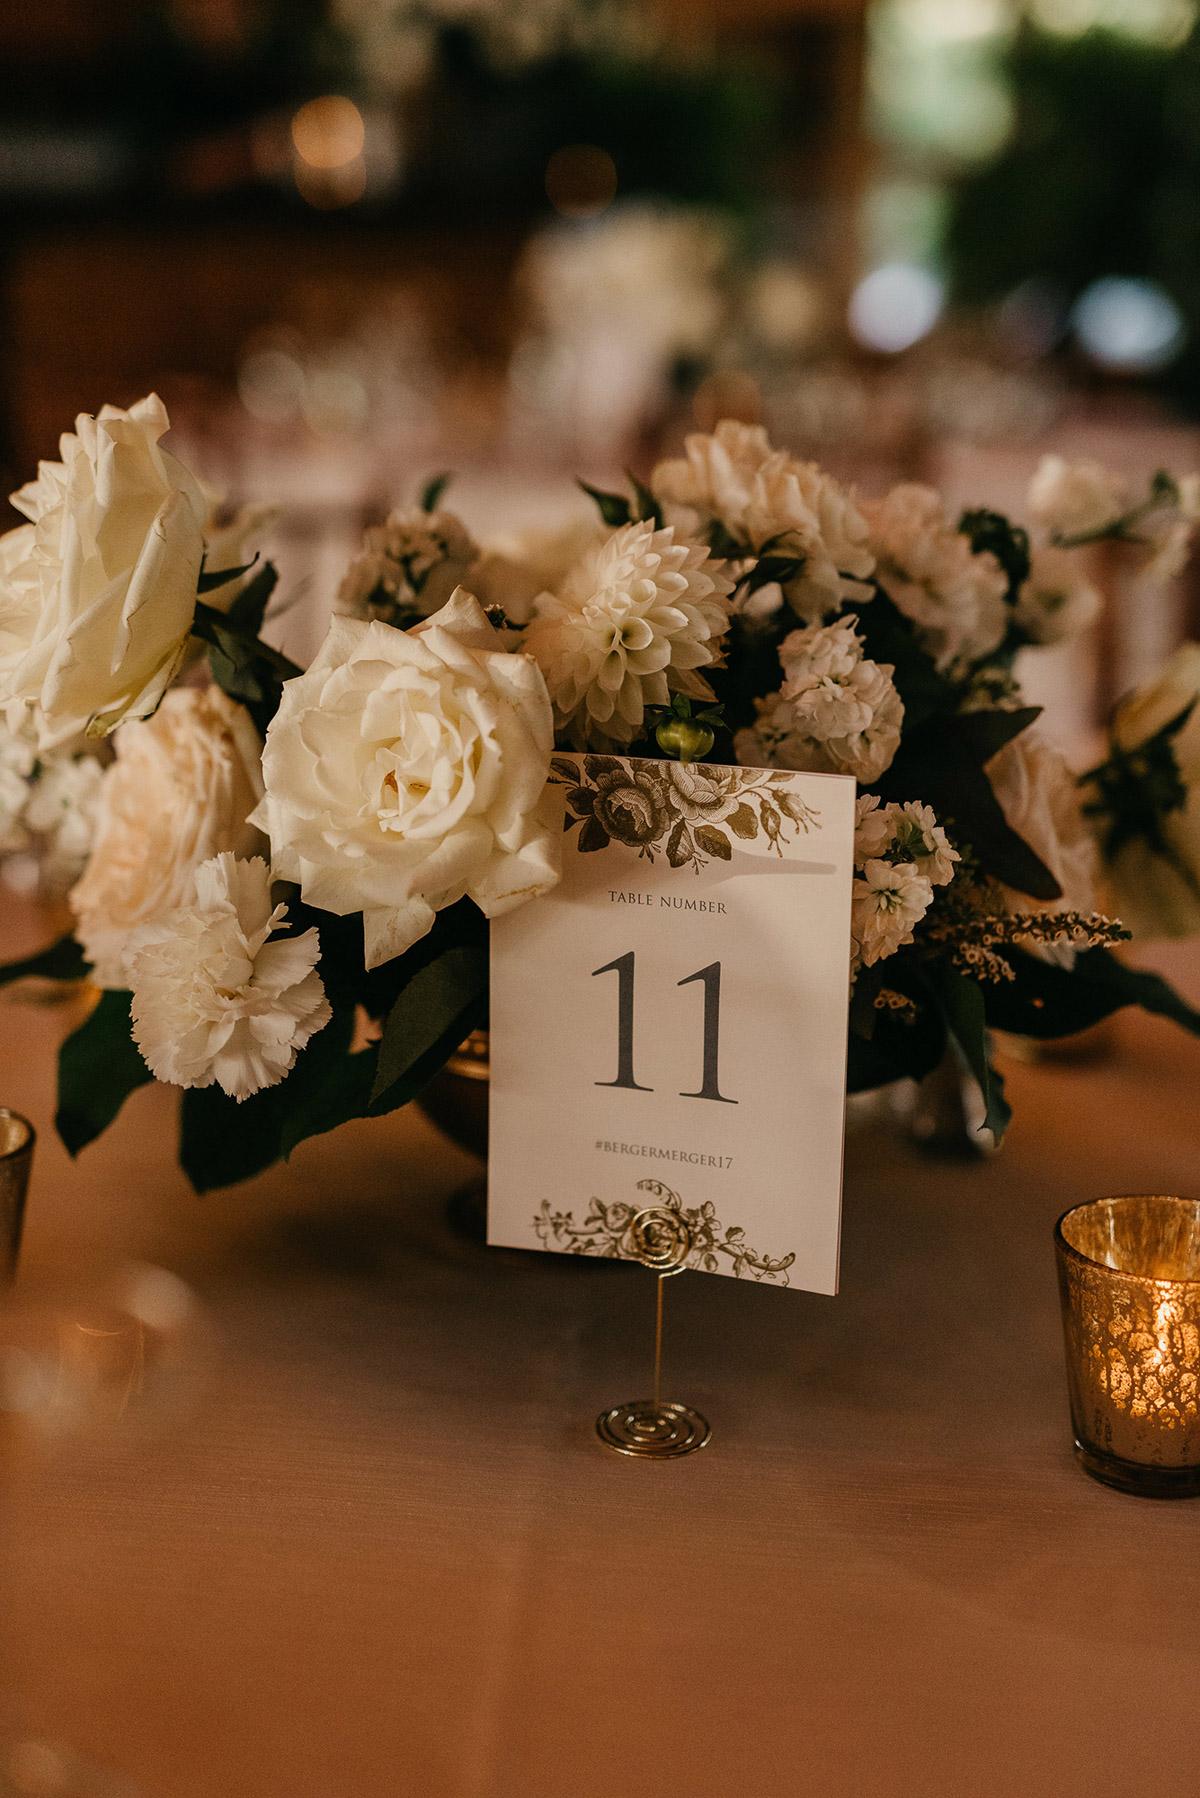 shaw-events-vineyard-bride-swish-list-kurtz-orchards-niagara-on-the-lake-wedding-33.jpg